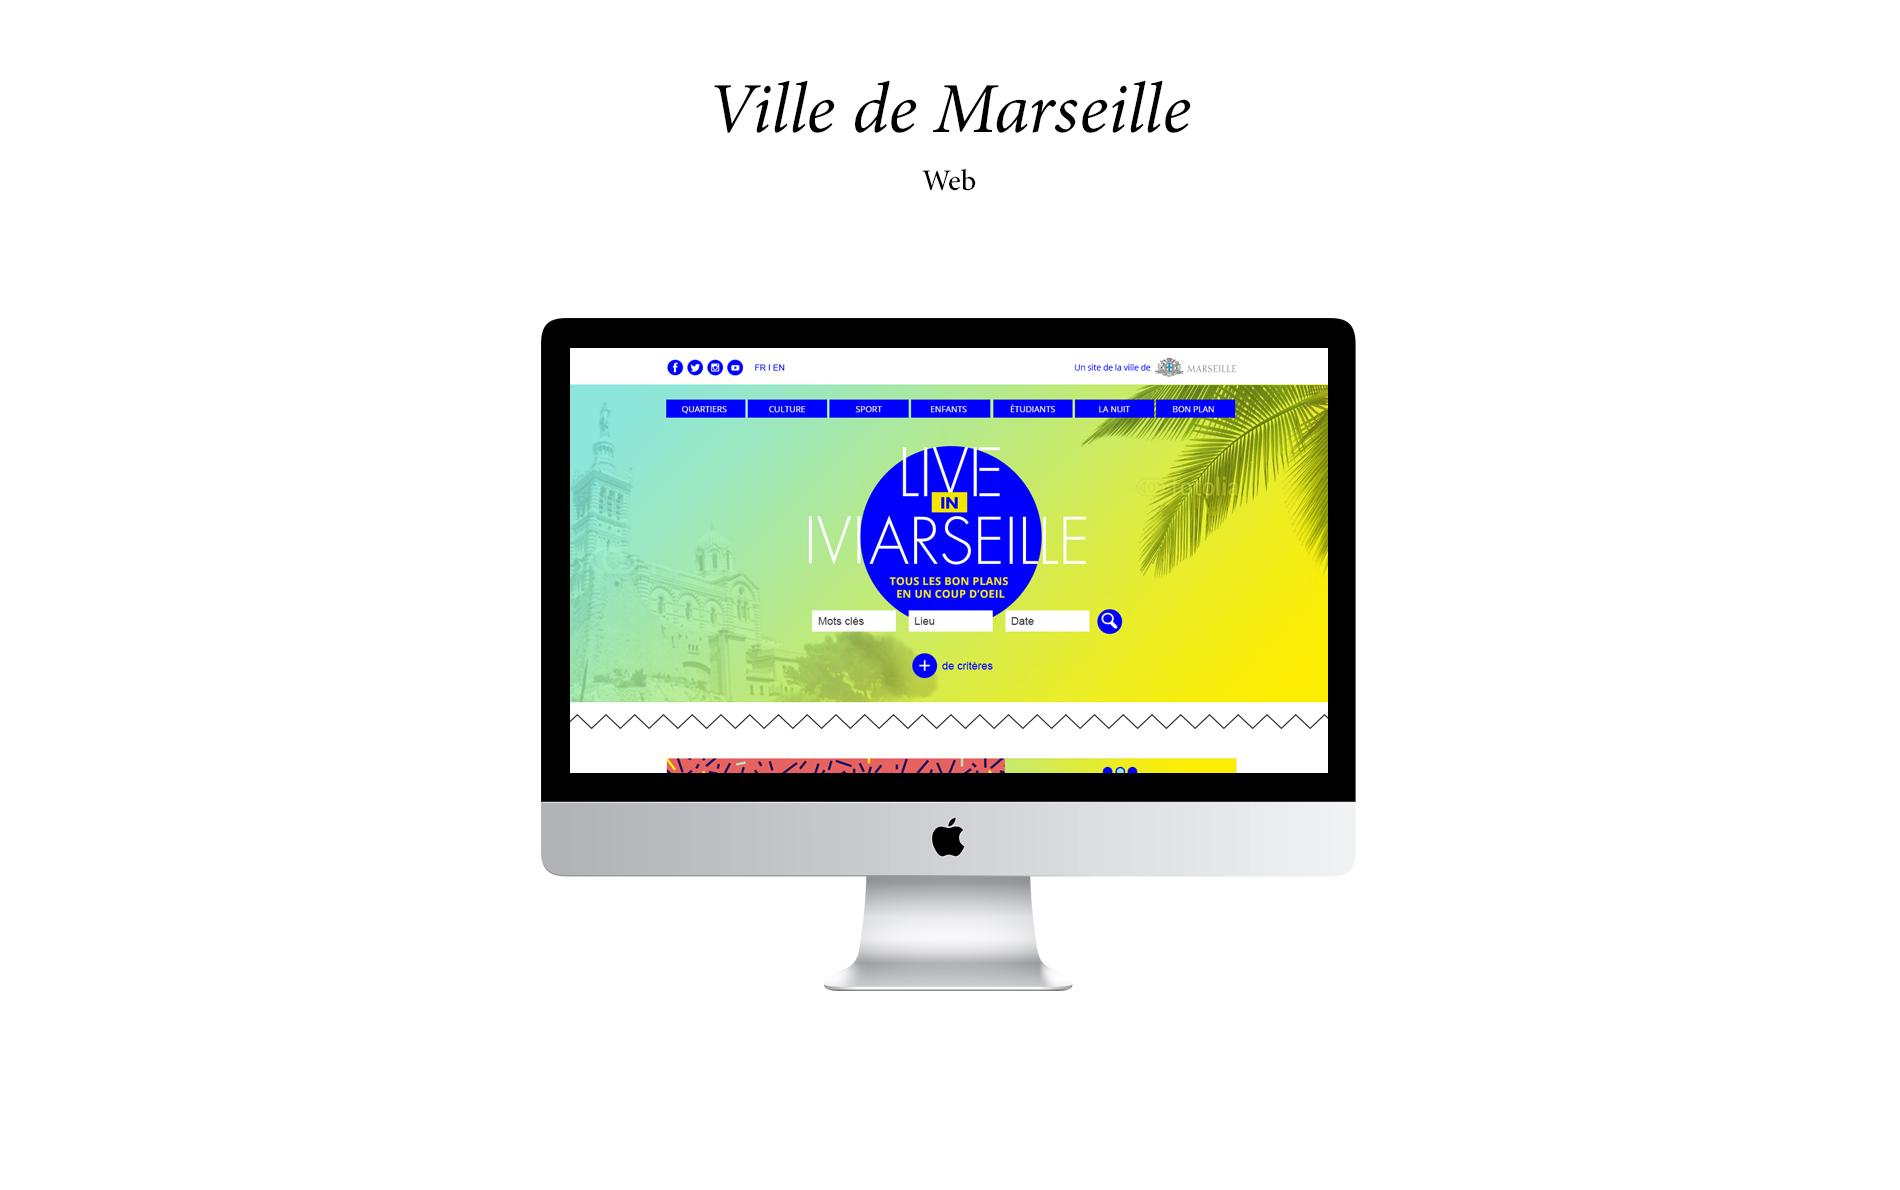 live_marseille_02